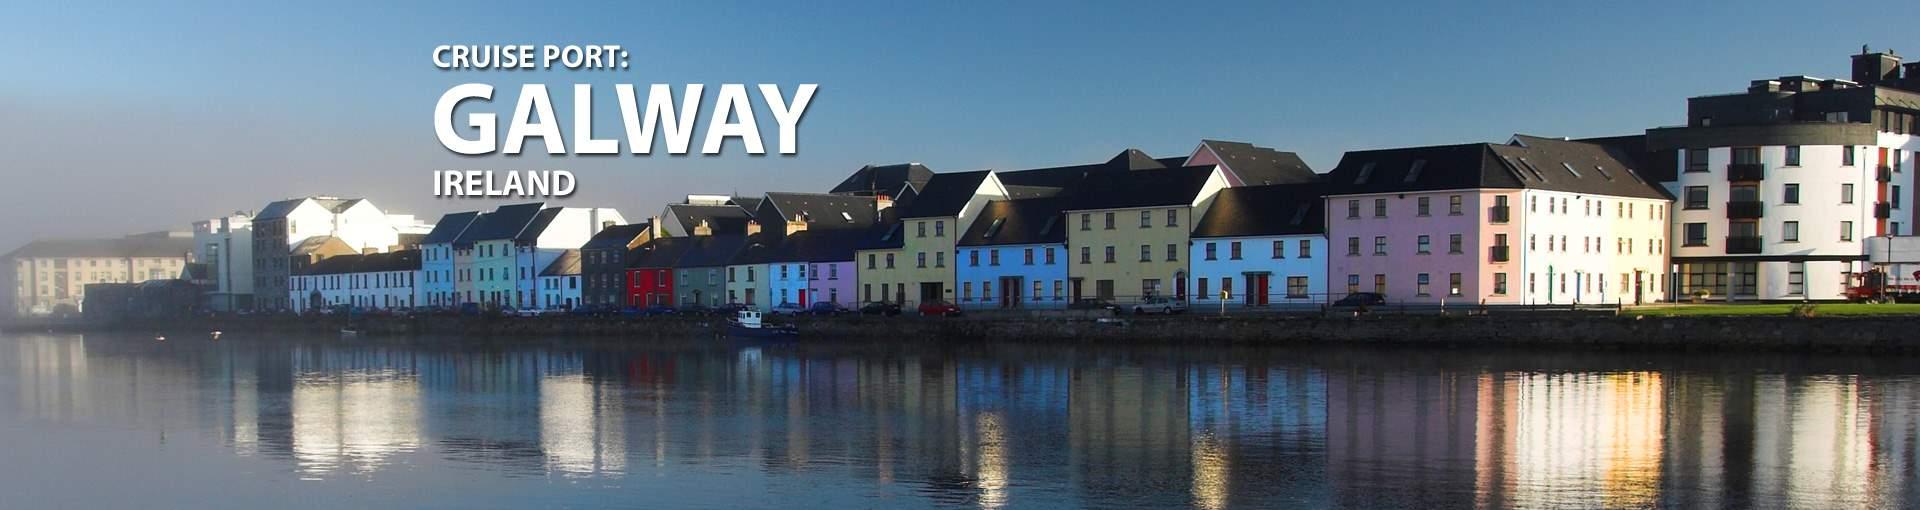 Cruises to Galway, Ireland